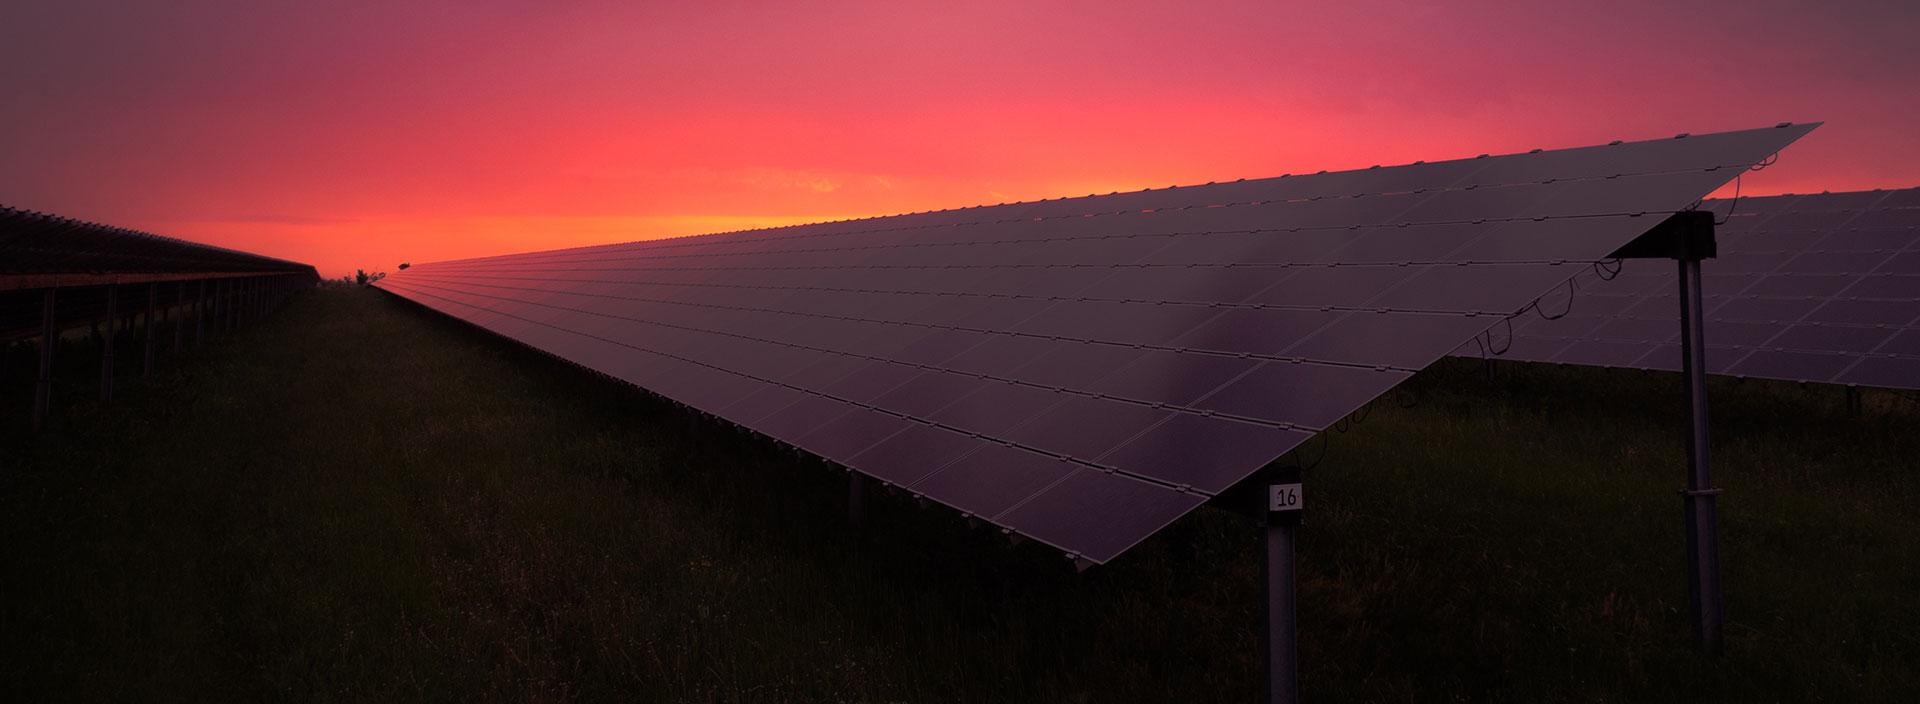 Solar Stats background image